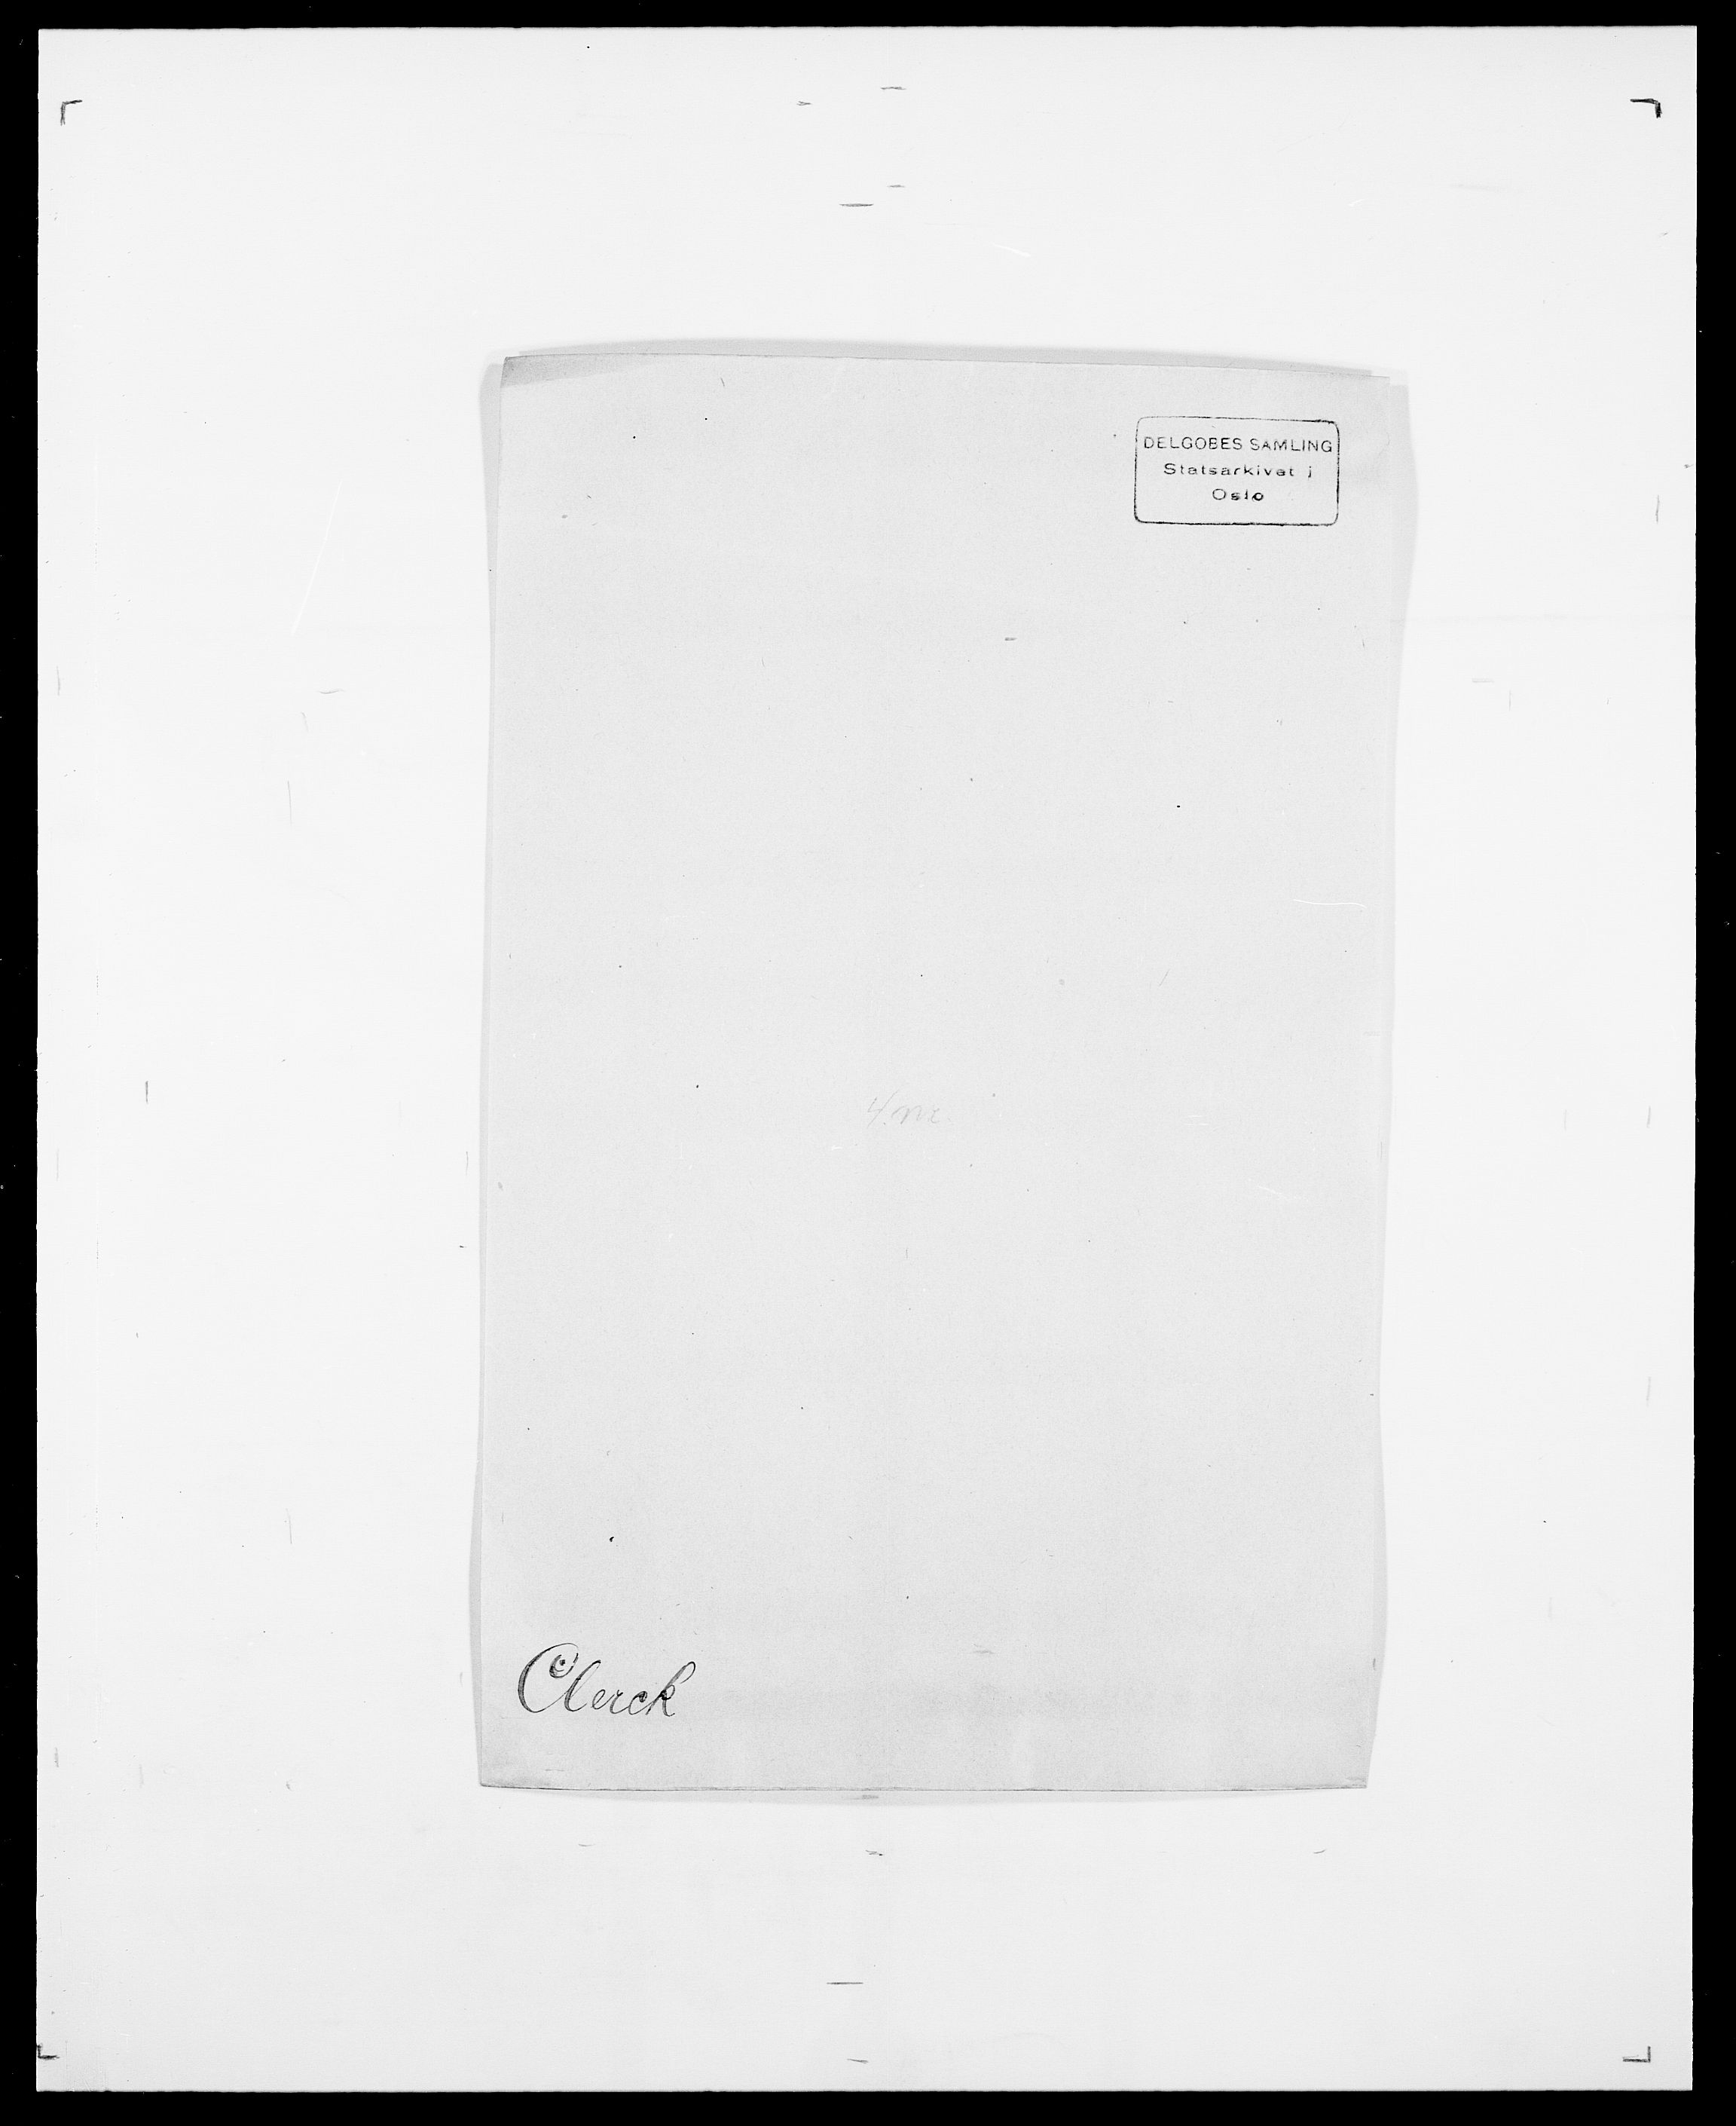 SAO, Delgobe, Charles Antoine - samling, D/Da/L0008: Capjon - Dagenbolt, s. 368